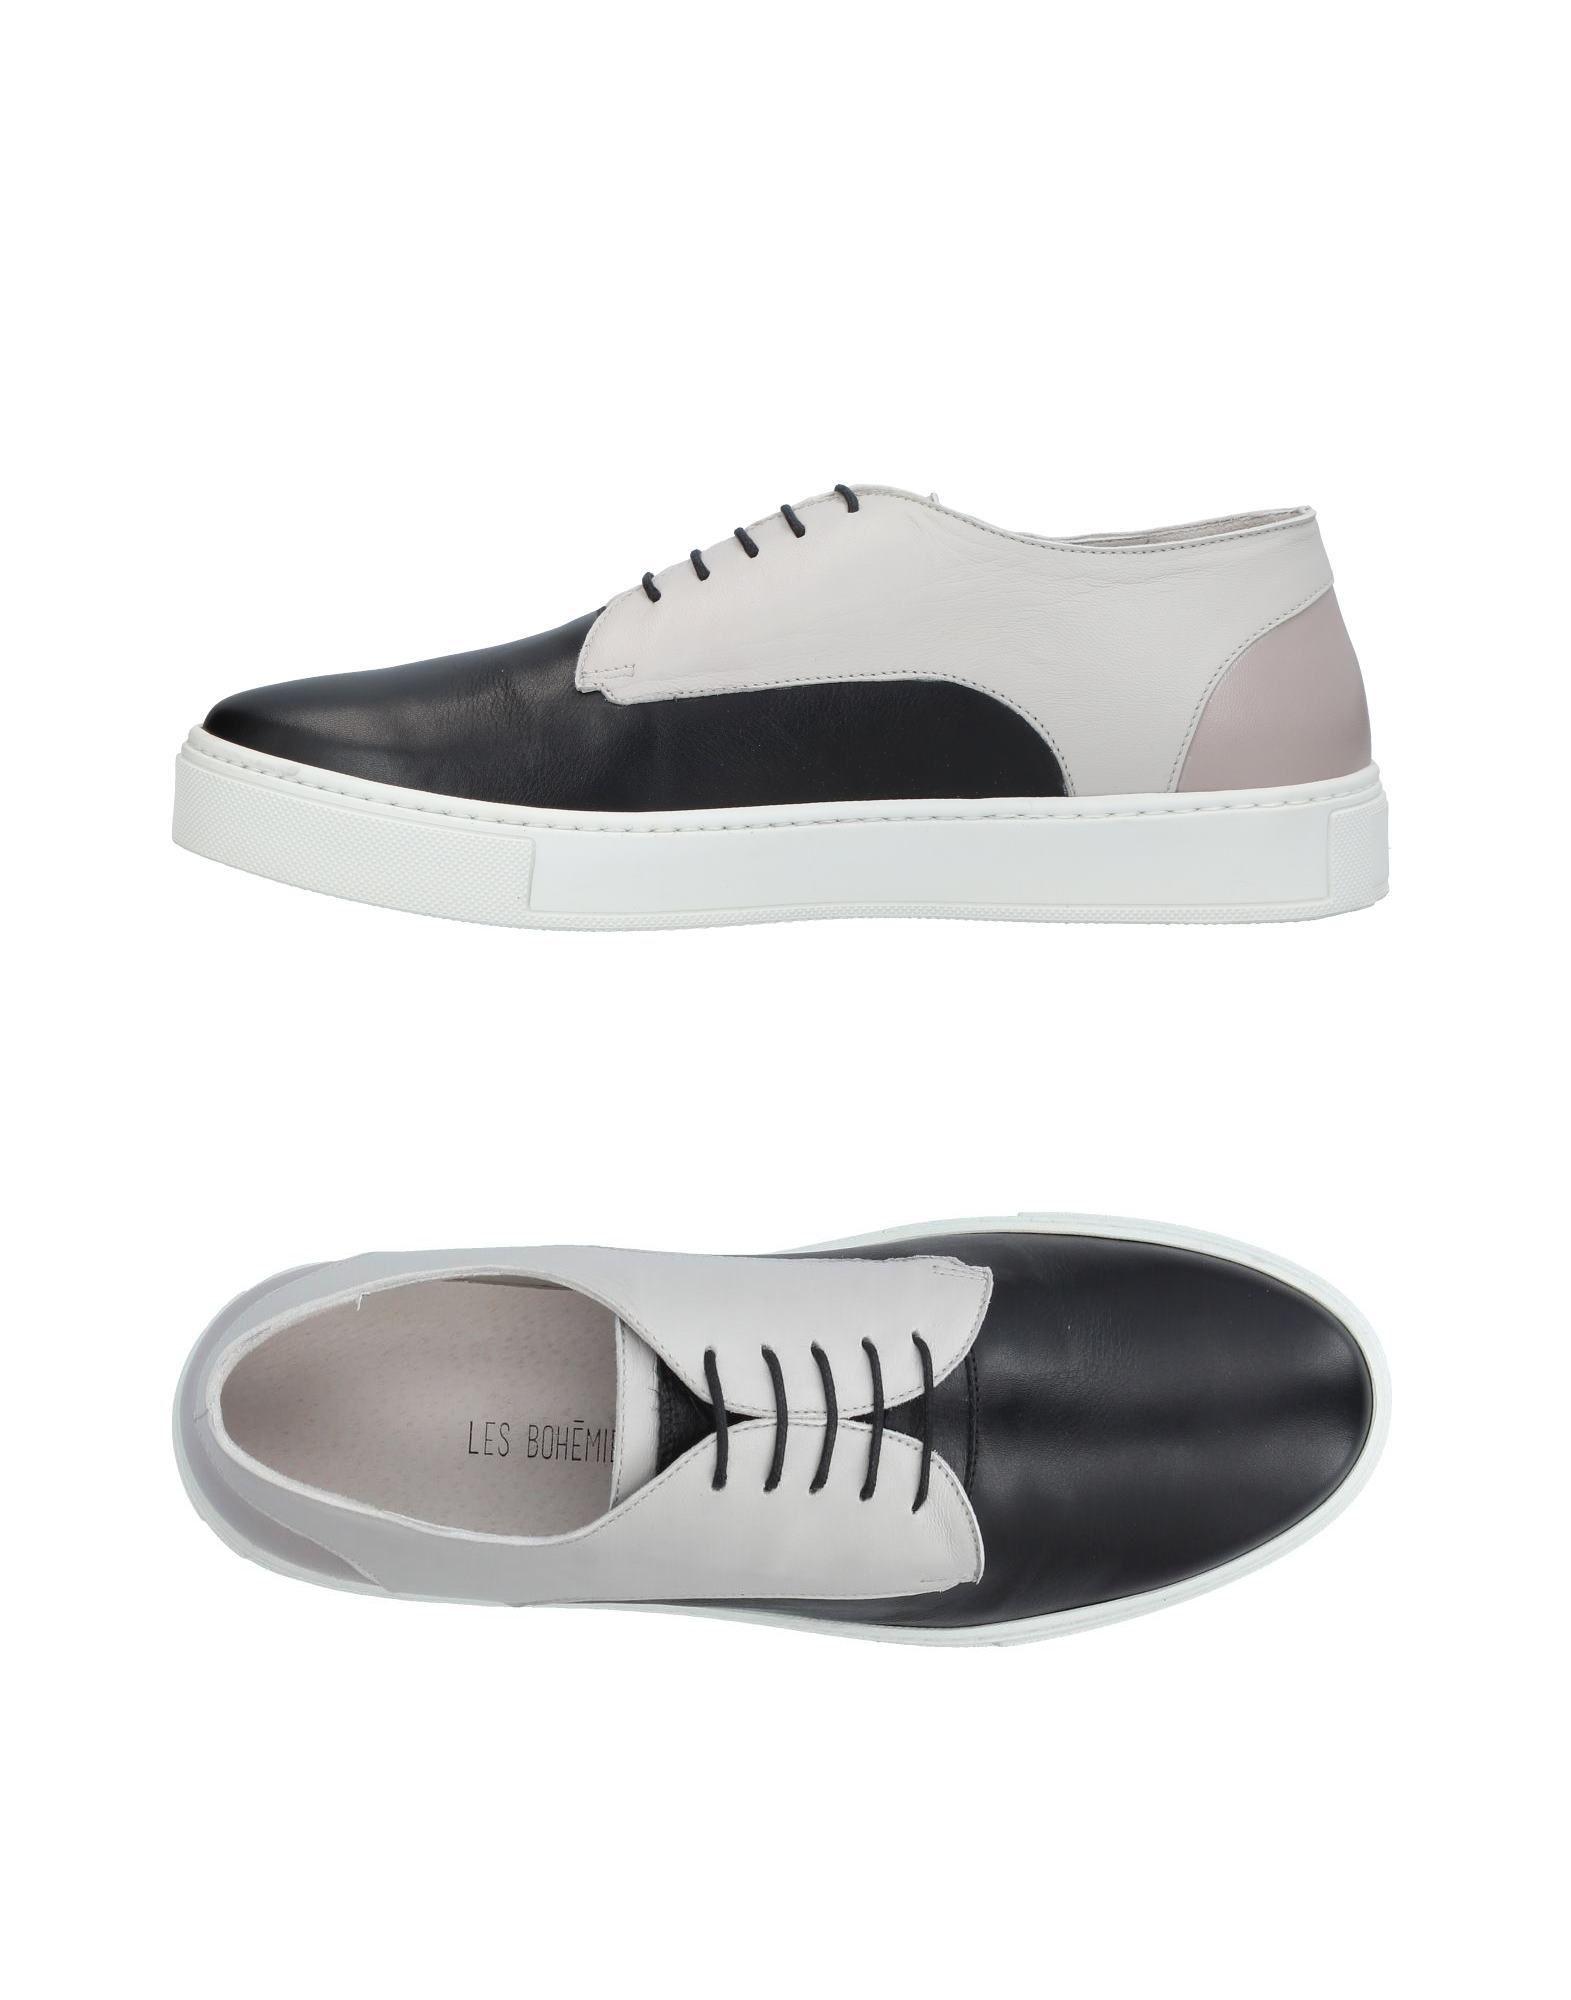 Sneakers Les Bohēmiens Donna - Acquista online su